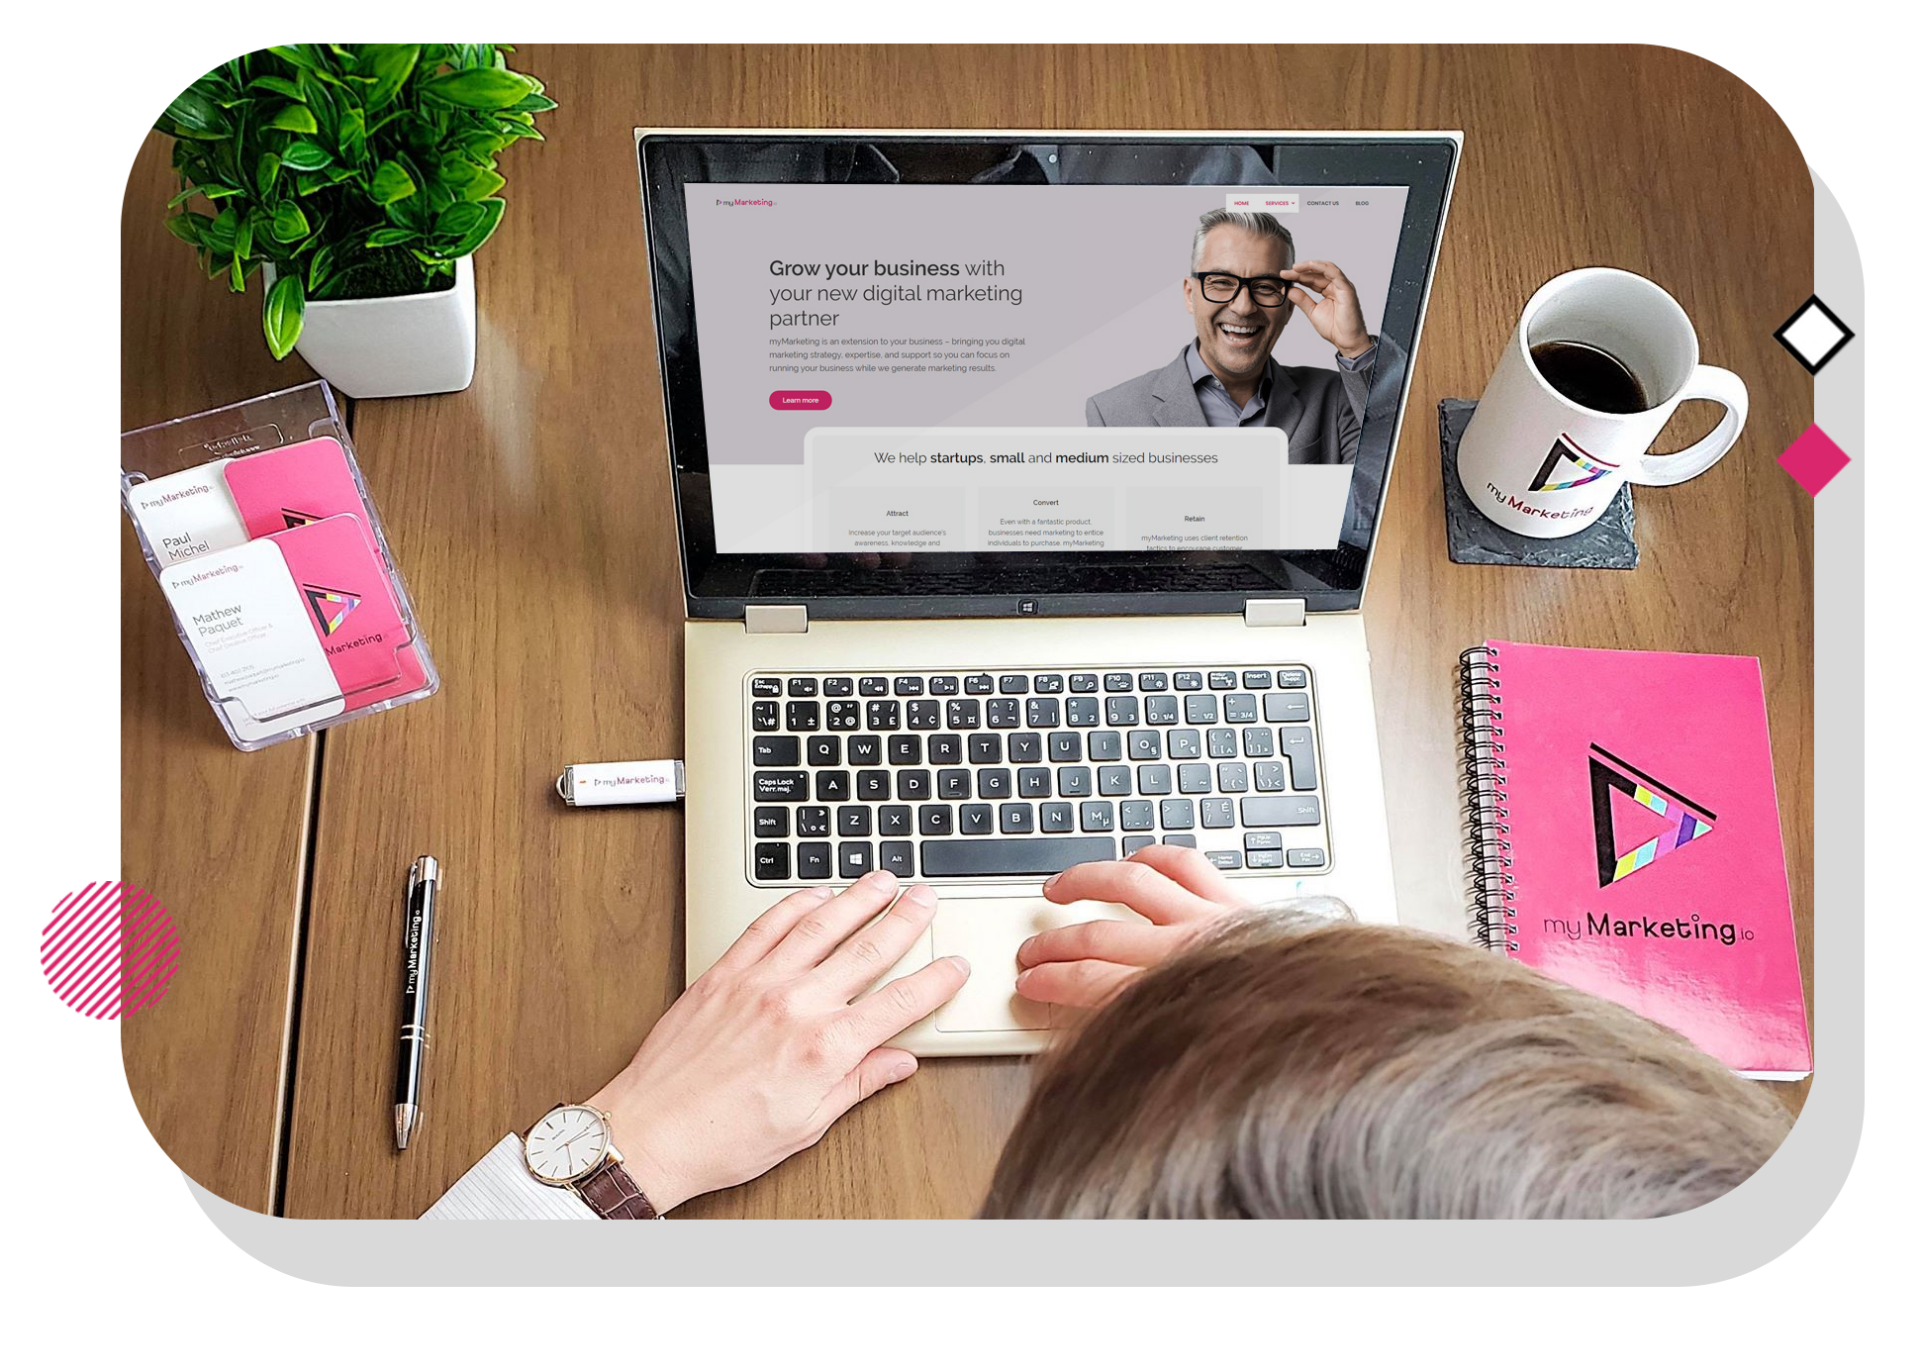 myMarketing website homepage and branding materials.